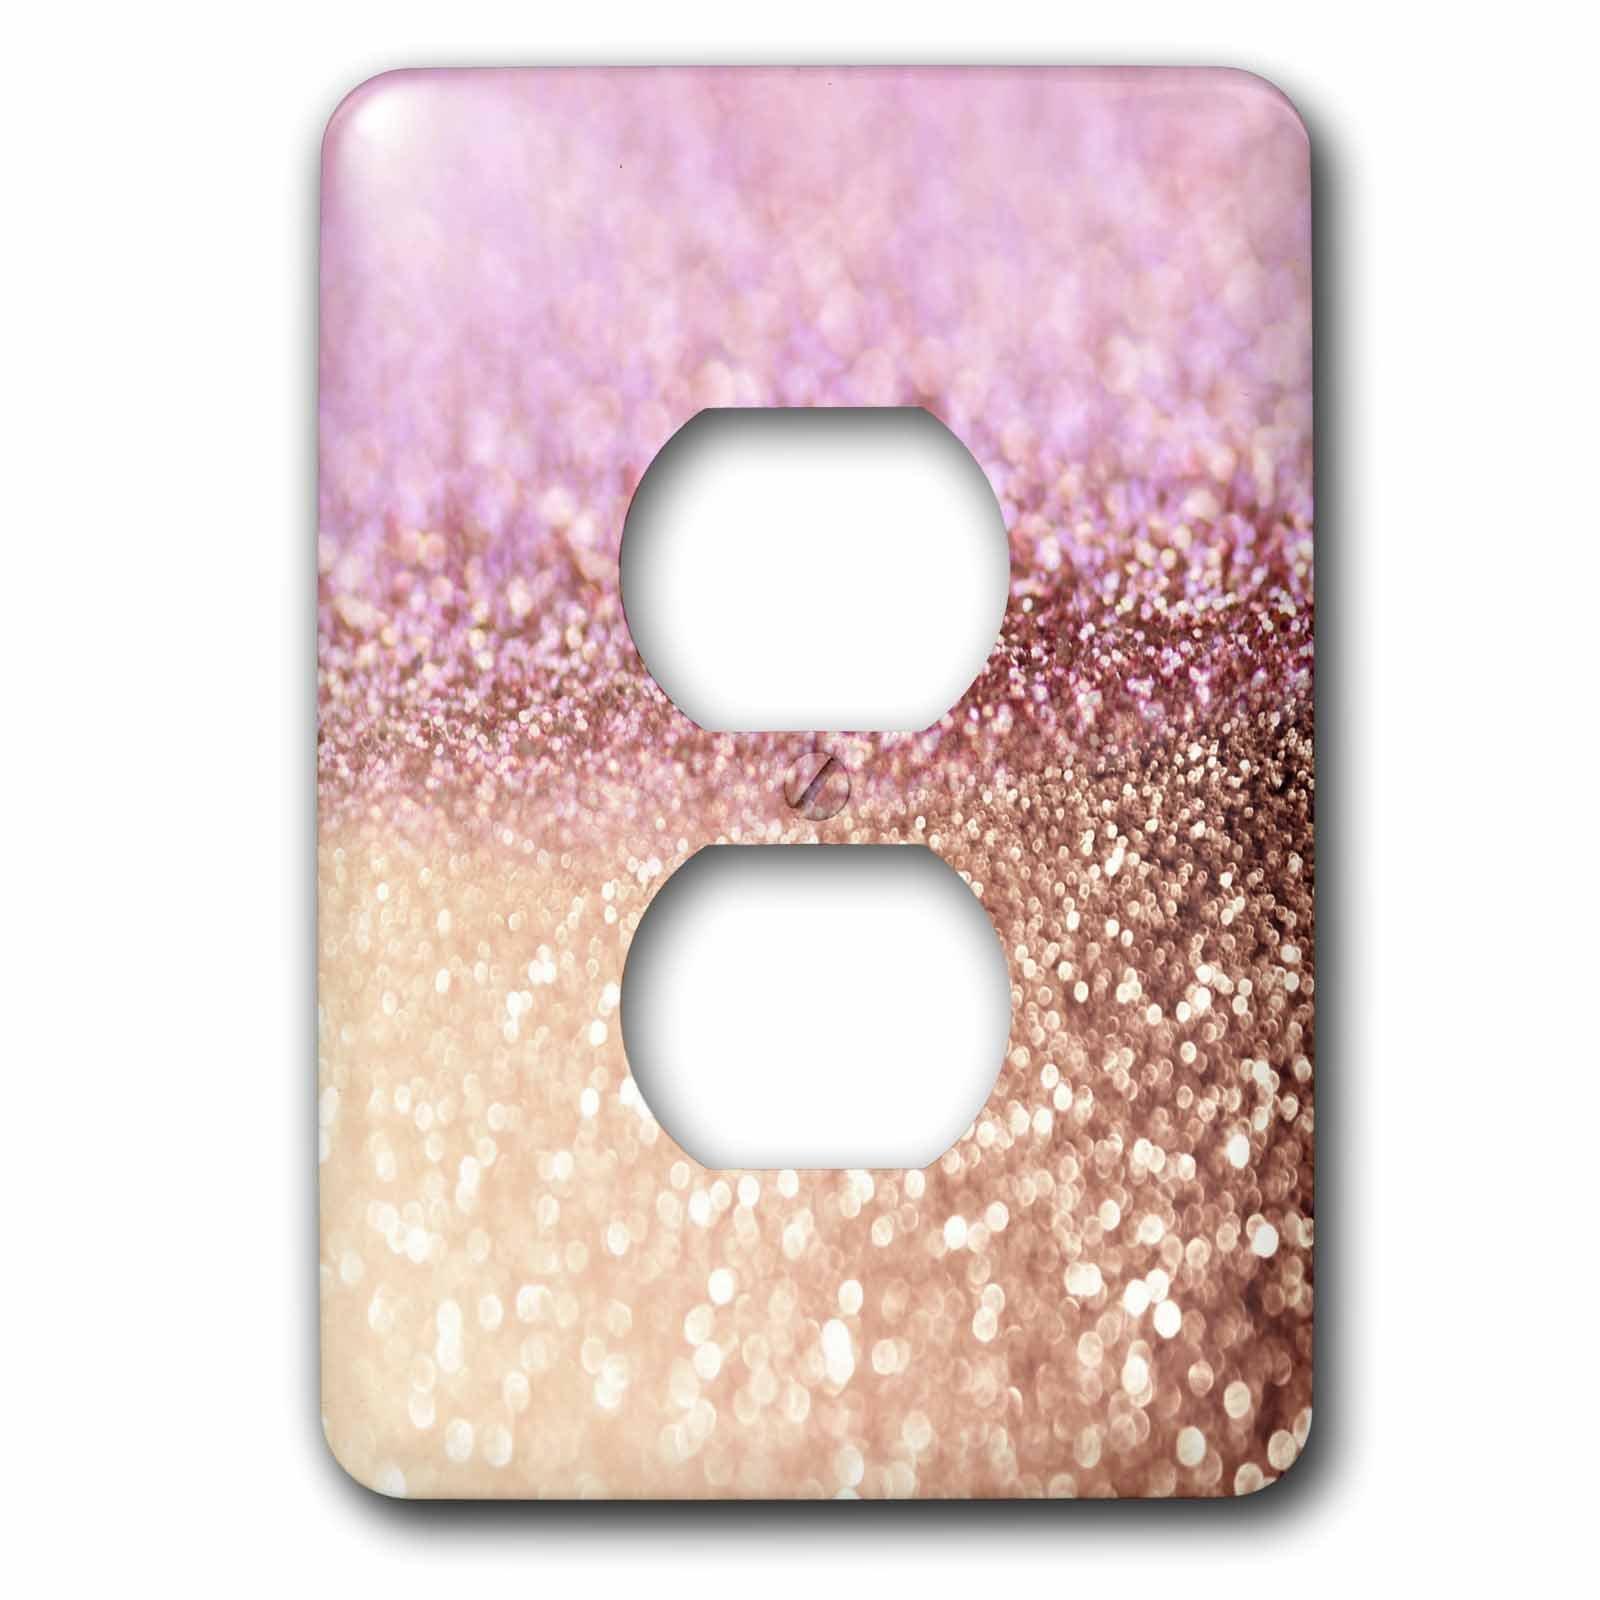 3dRose (lsp_272849_6) 2 Plug Outlet Cover (6) 2 Sparkling Rose Gold Pink Luxury Shine Girly Elegant Mermaid Glitter